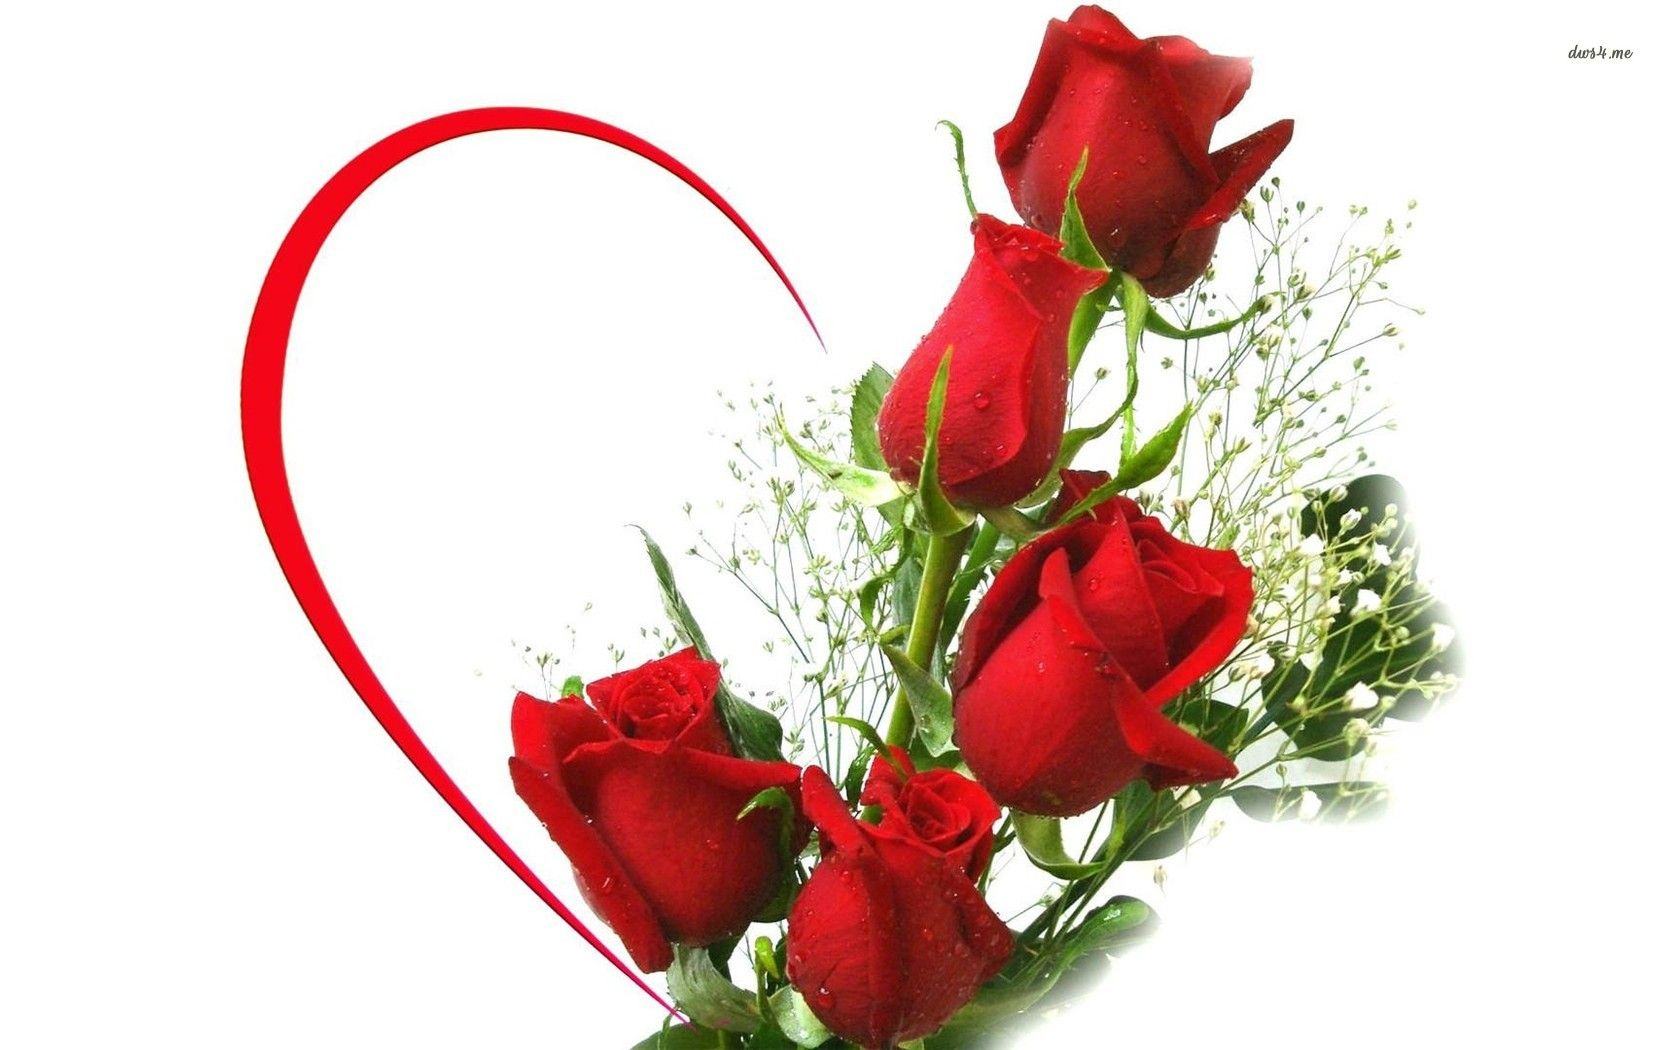 Red Rose Bouquet Hd Wallpaper Love Rose Flower Beautiful Love Flowers Red Roses Wallpaper